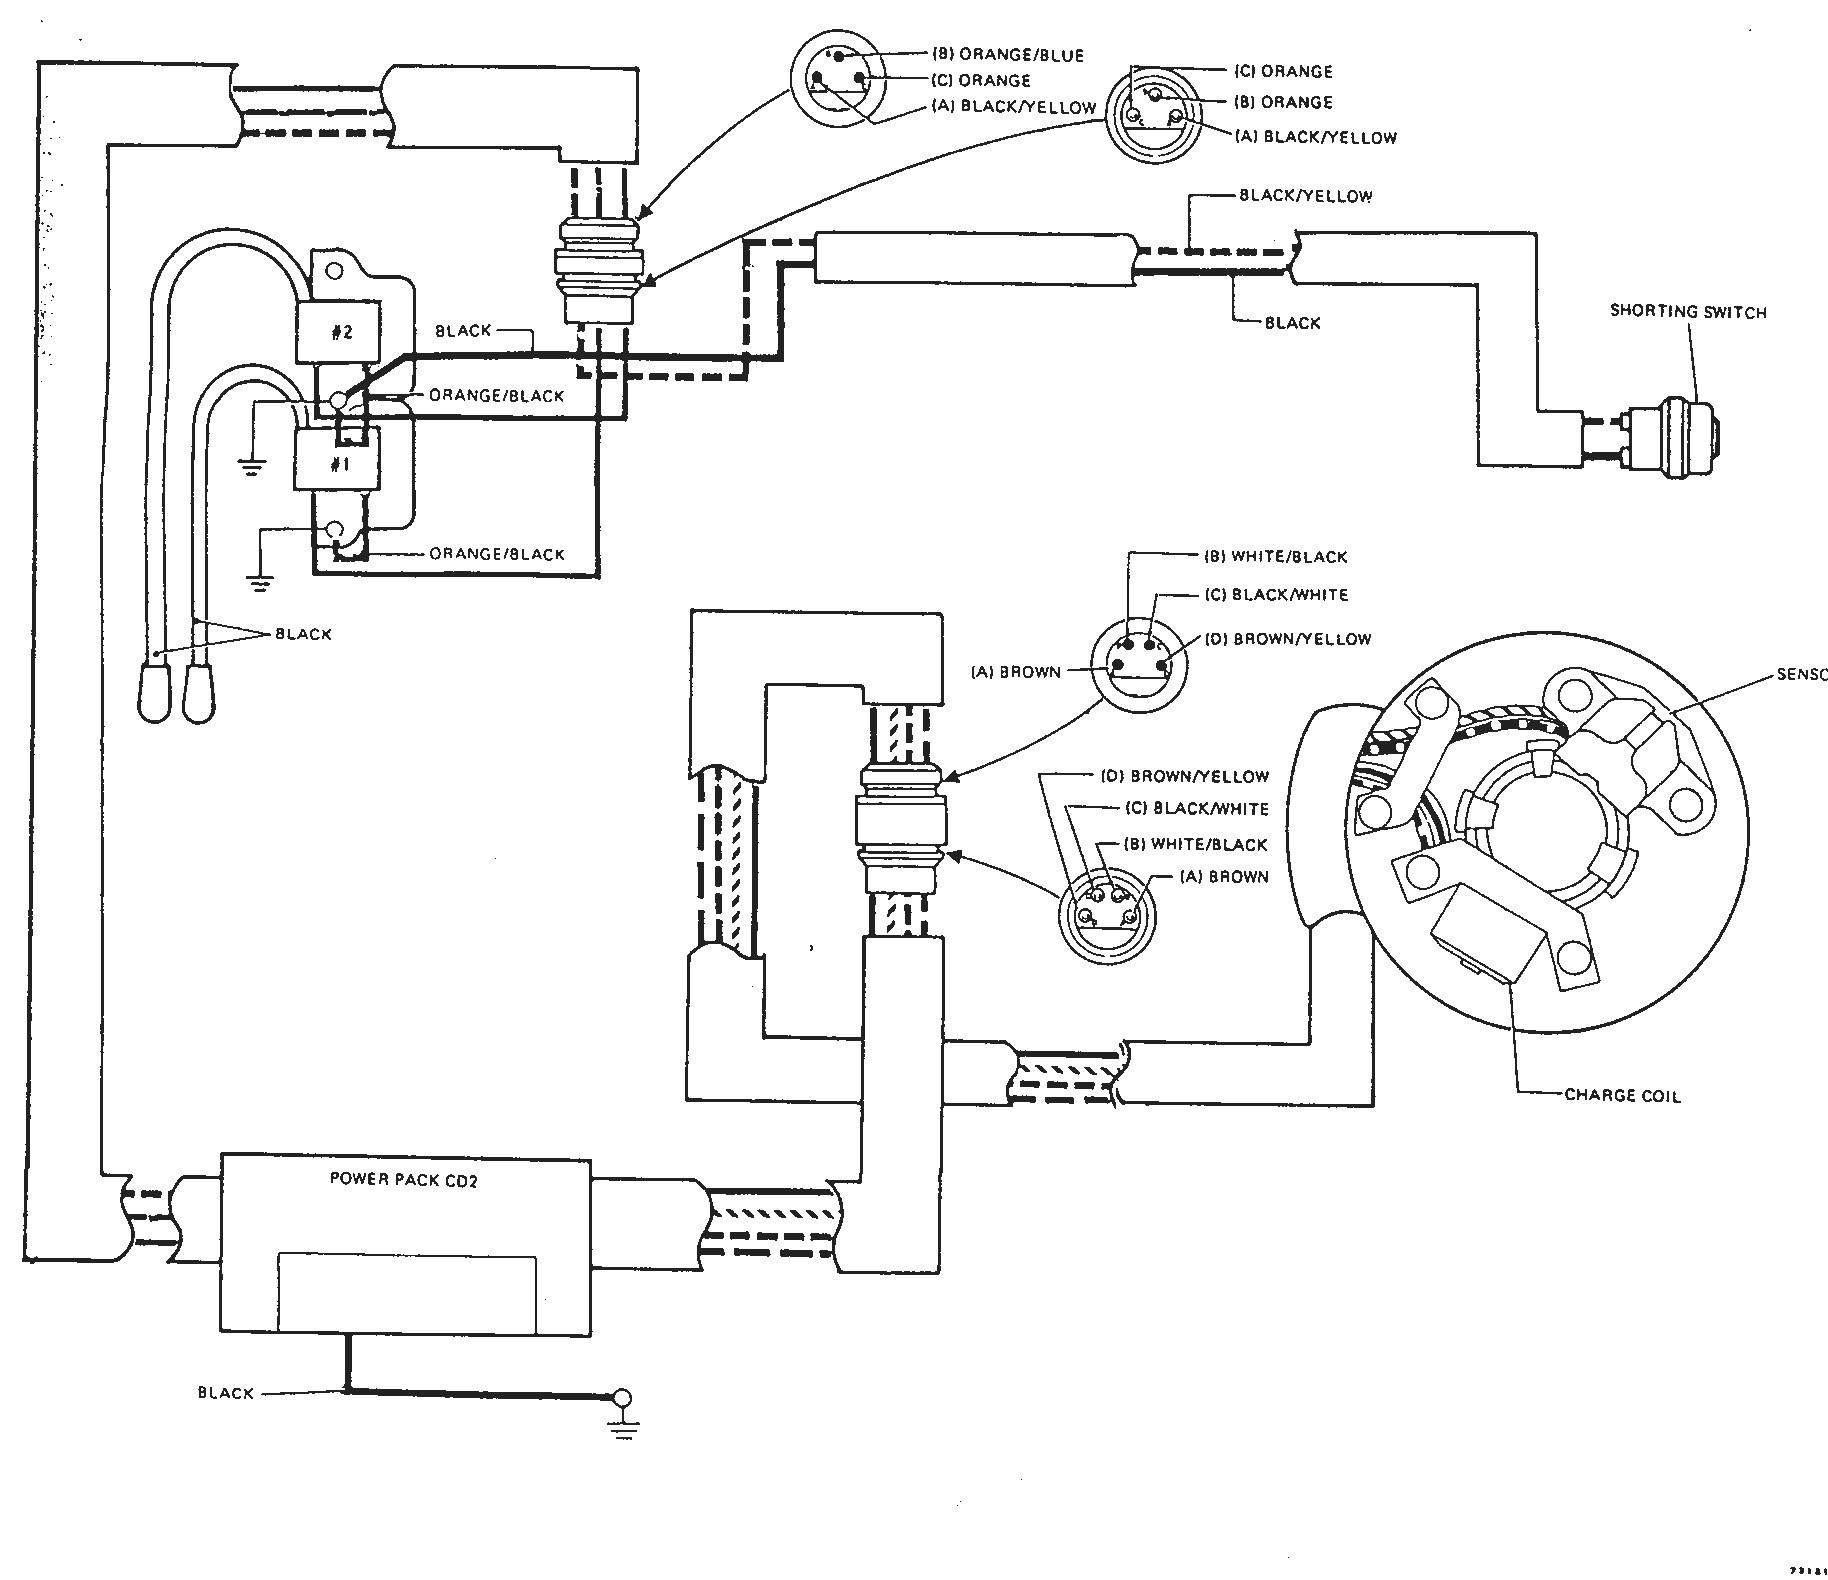 emg afterburner wiring diagram wiring diagram database  emg hz pickup coil tap wiring diagram wiring diagram database guitar wiring schematics